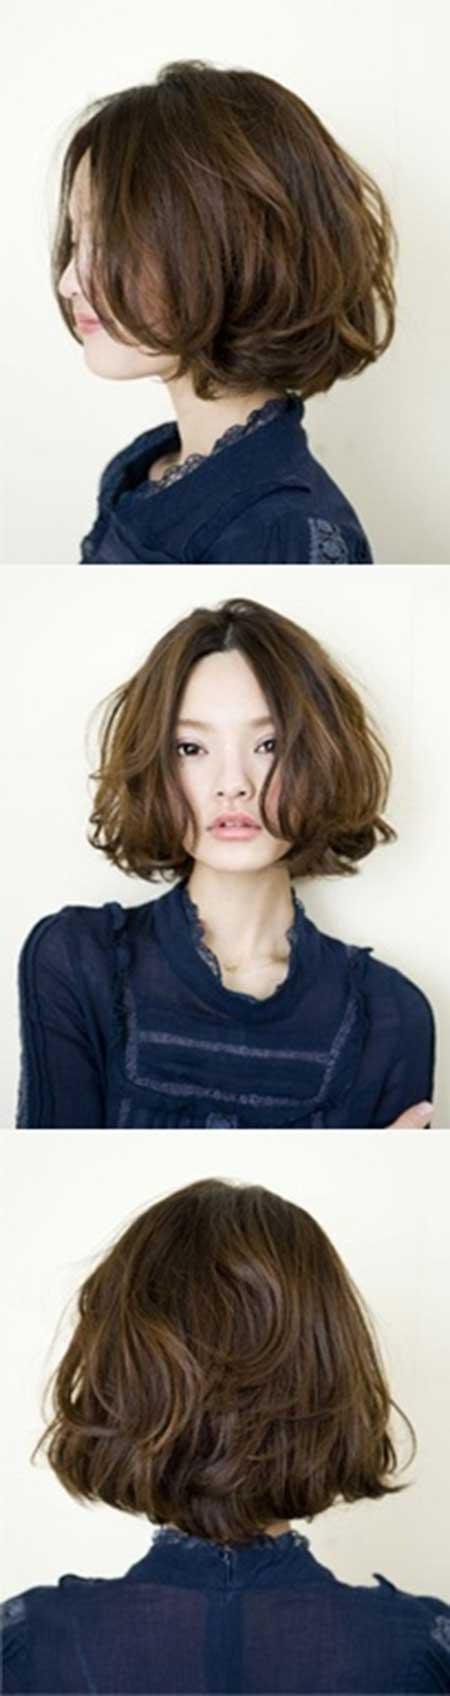 20 Haircuts for Short Wavy Hair_14